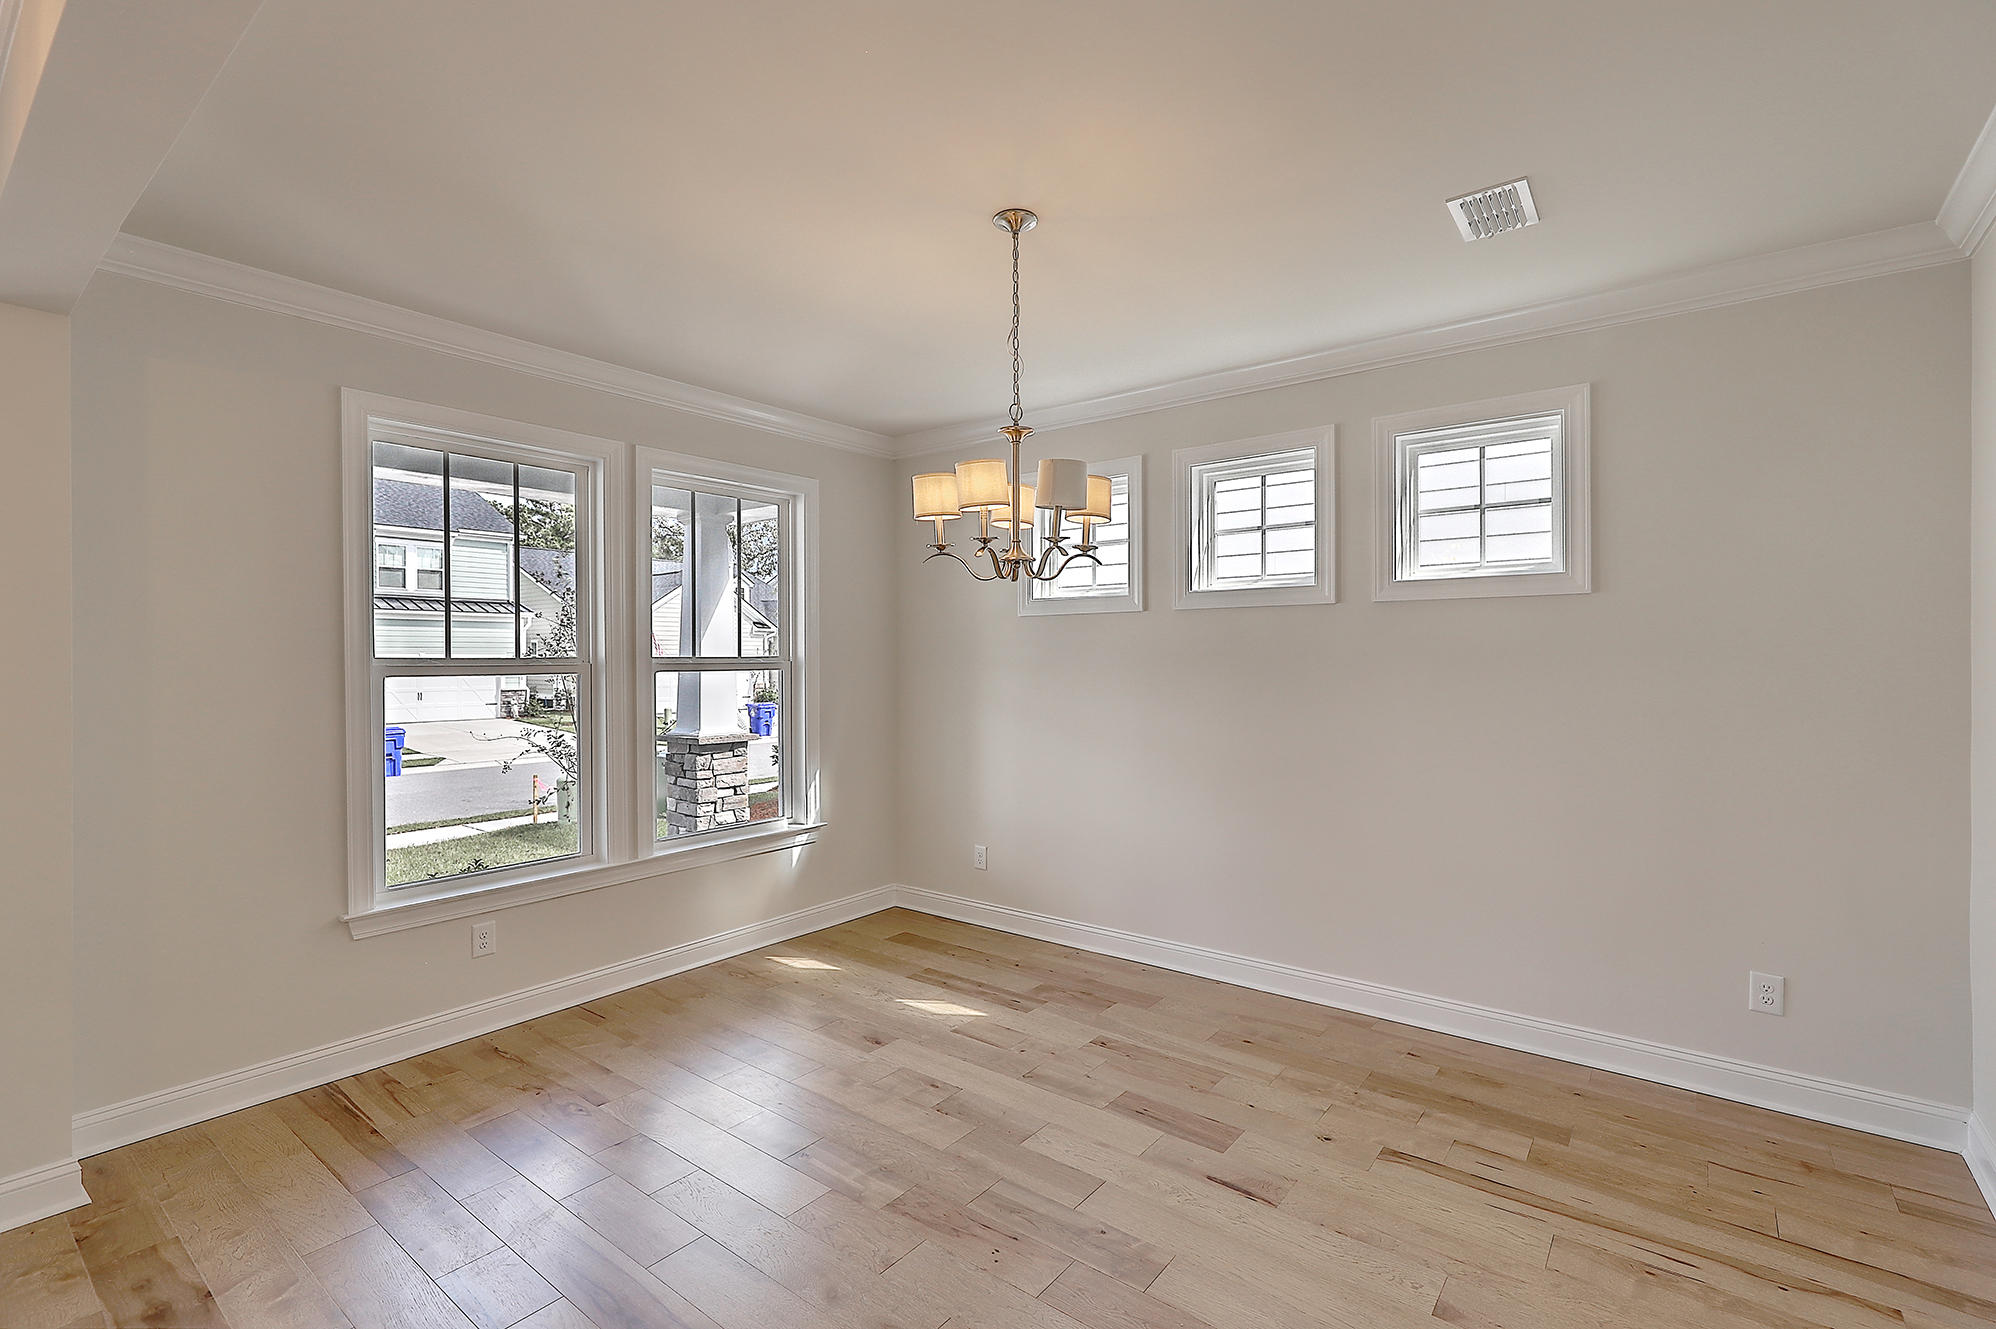 Bentley Park Homes For Sale - 1261 Gannett, Mount Pleasant, SC - 3